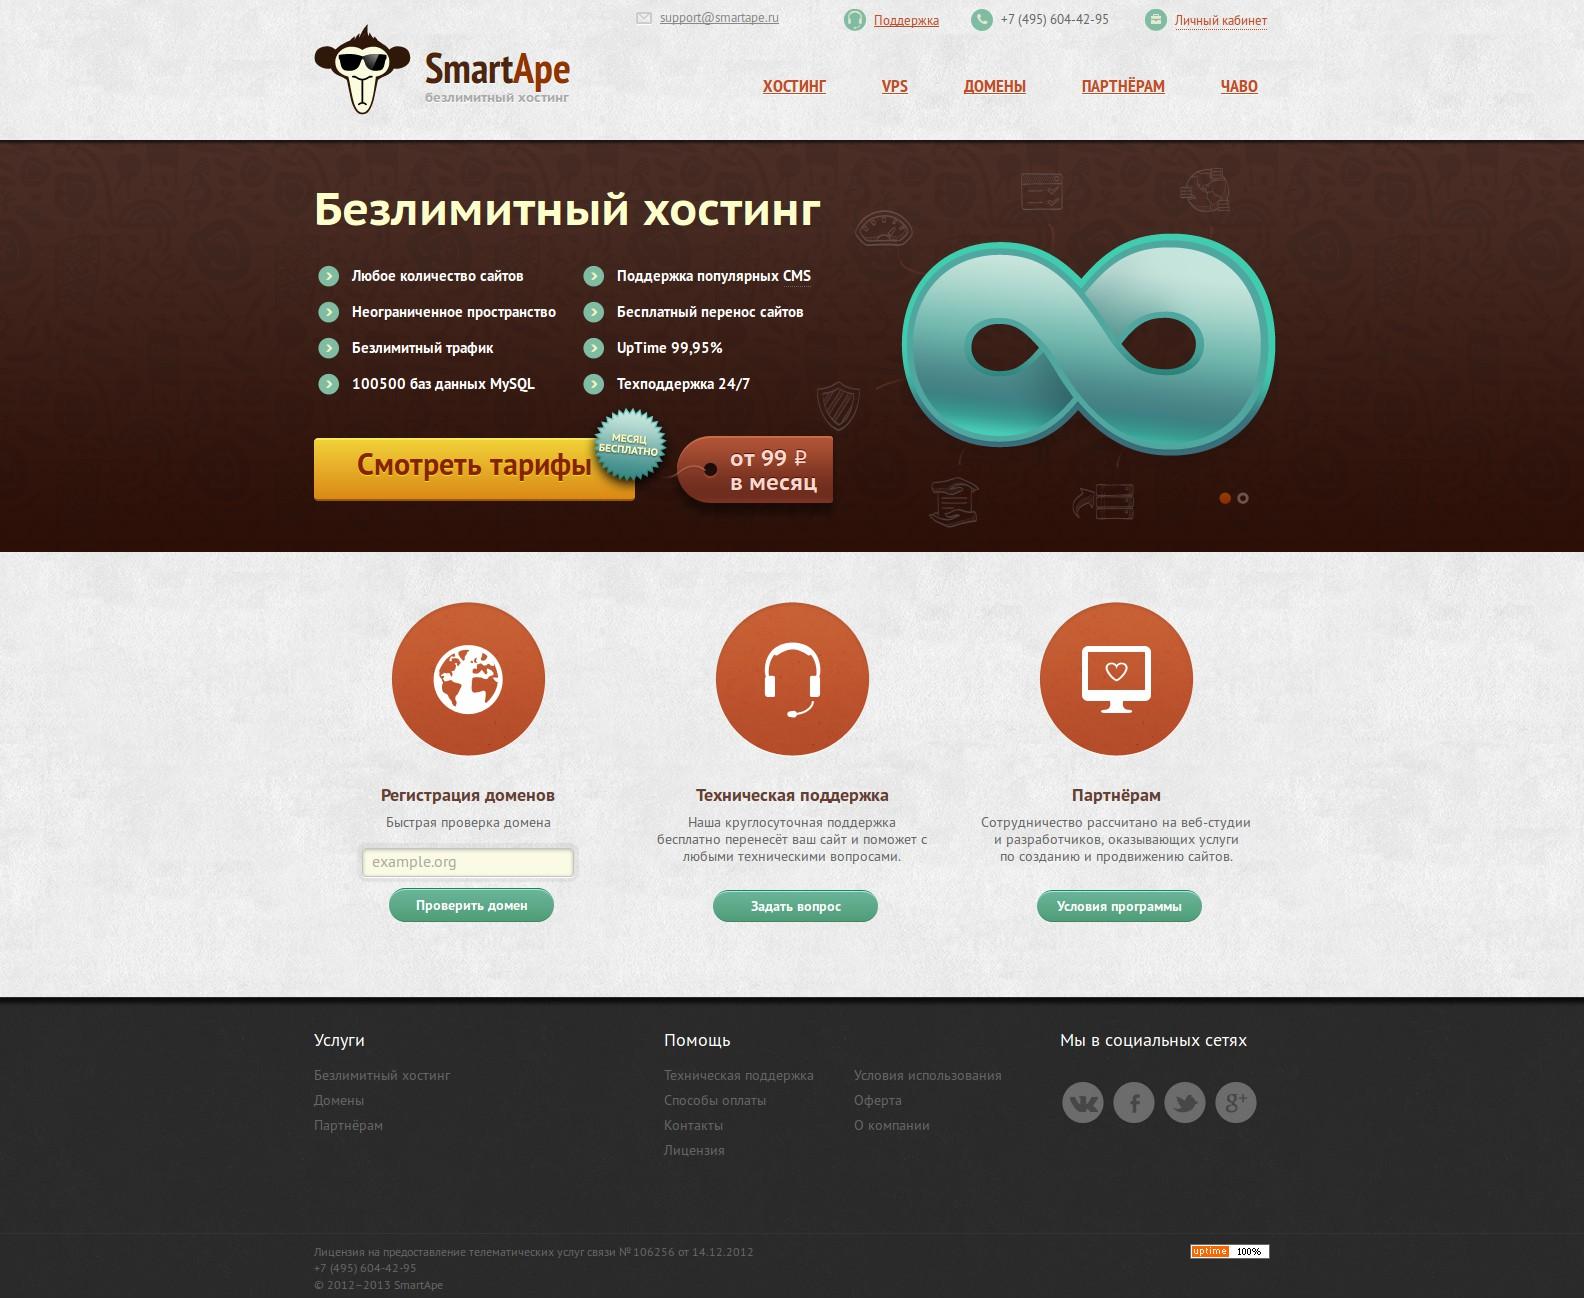 Специалист отдела технической поддержки SmartApe.ru